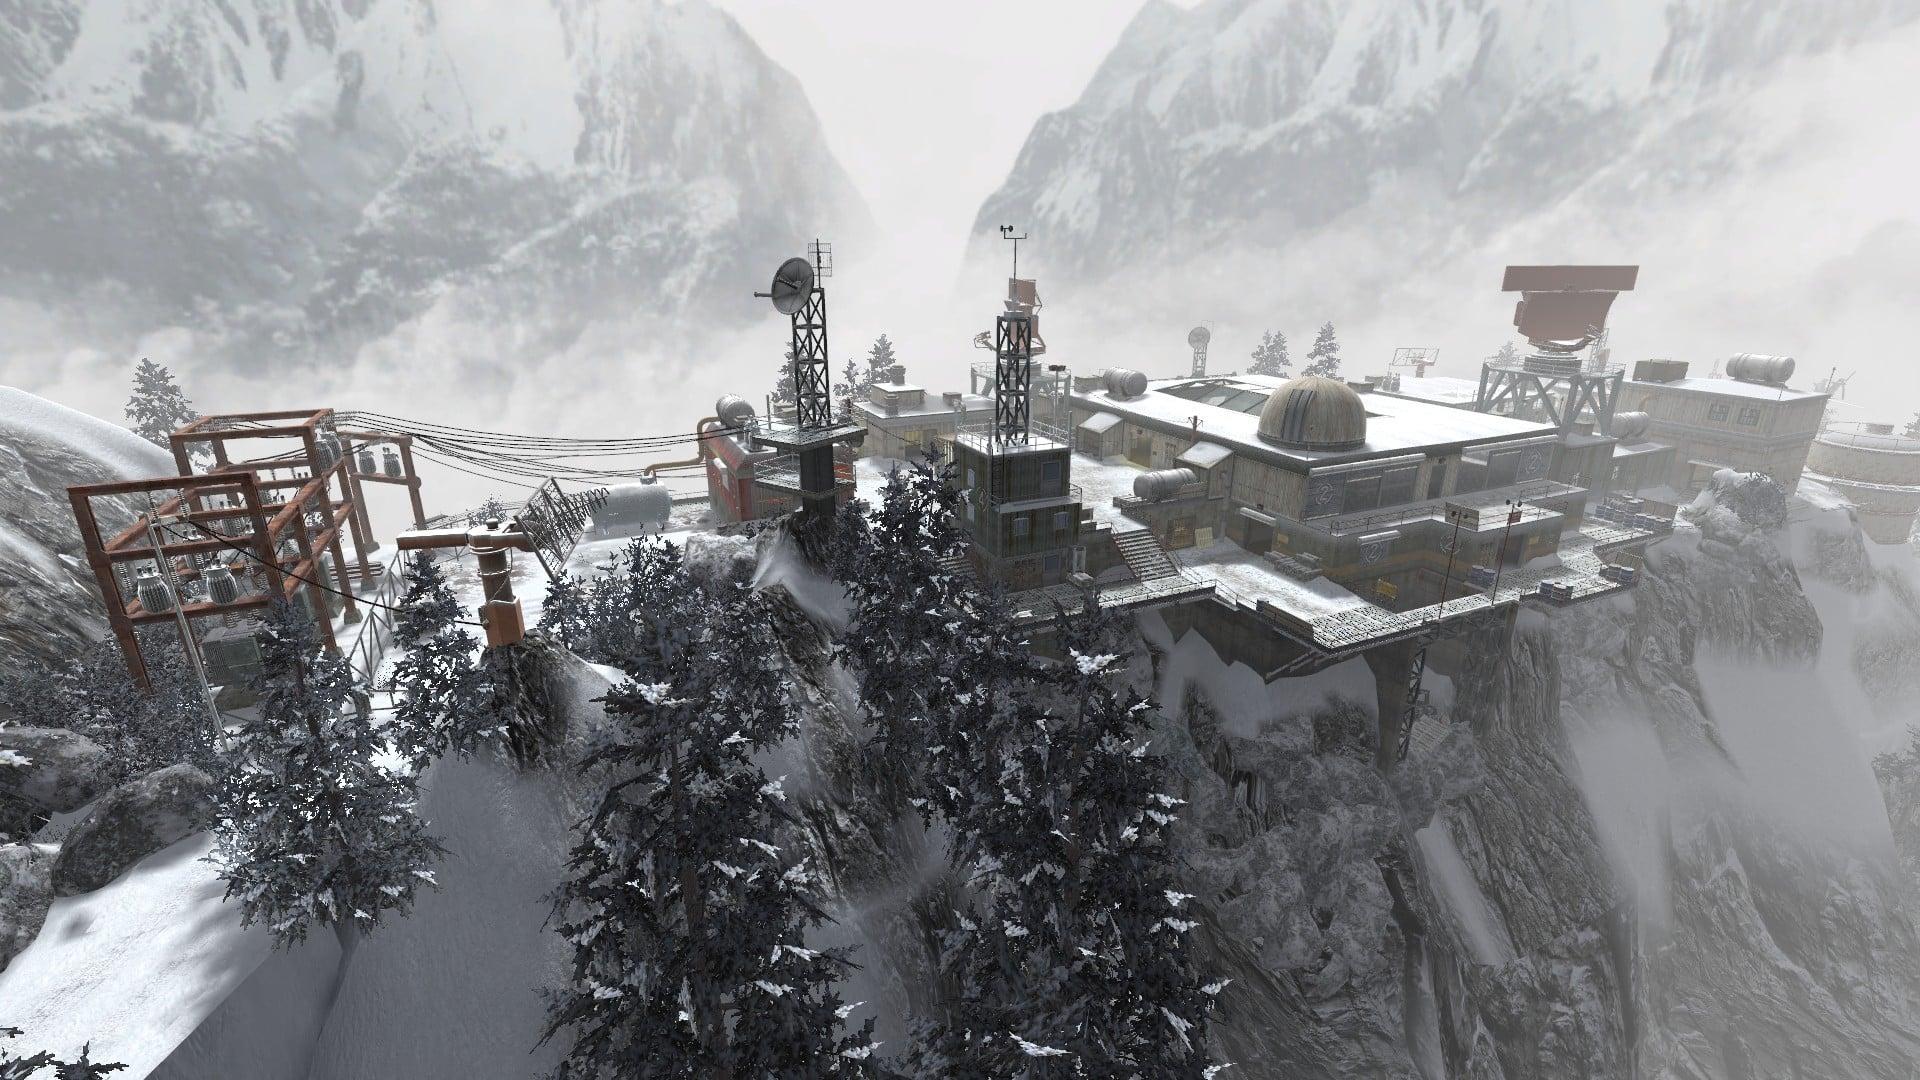 summit mappa multiplayer call of duty